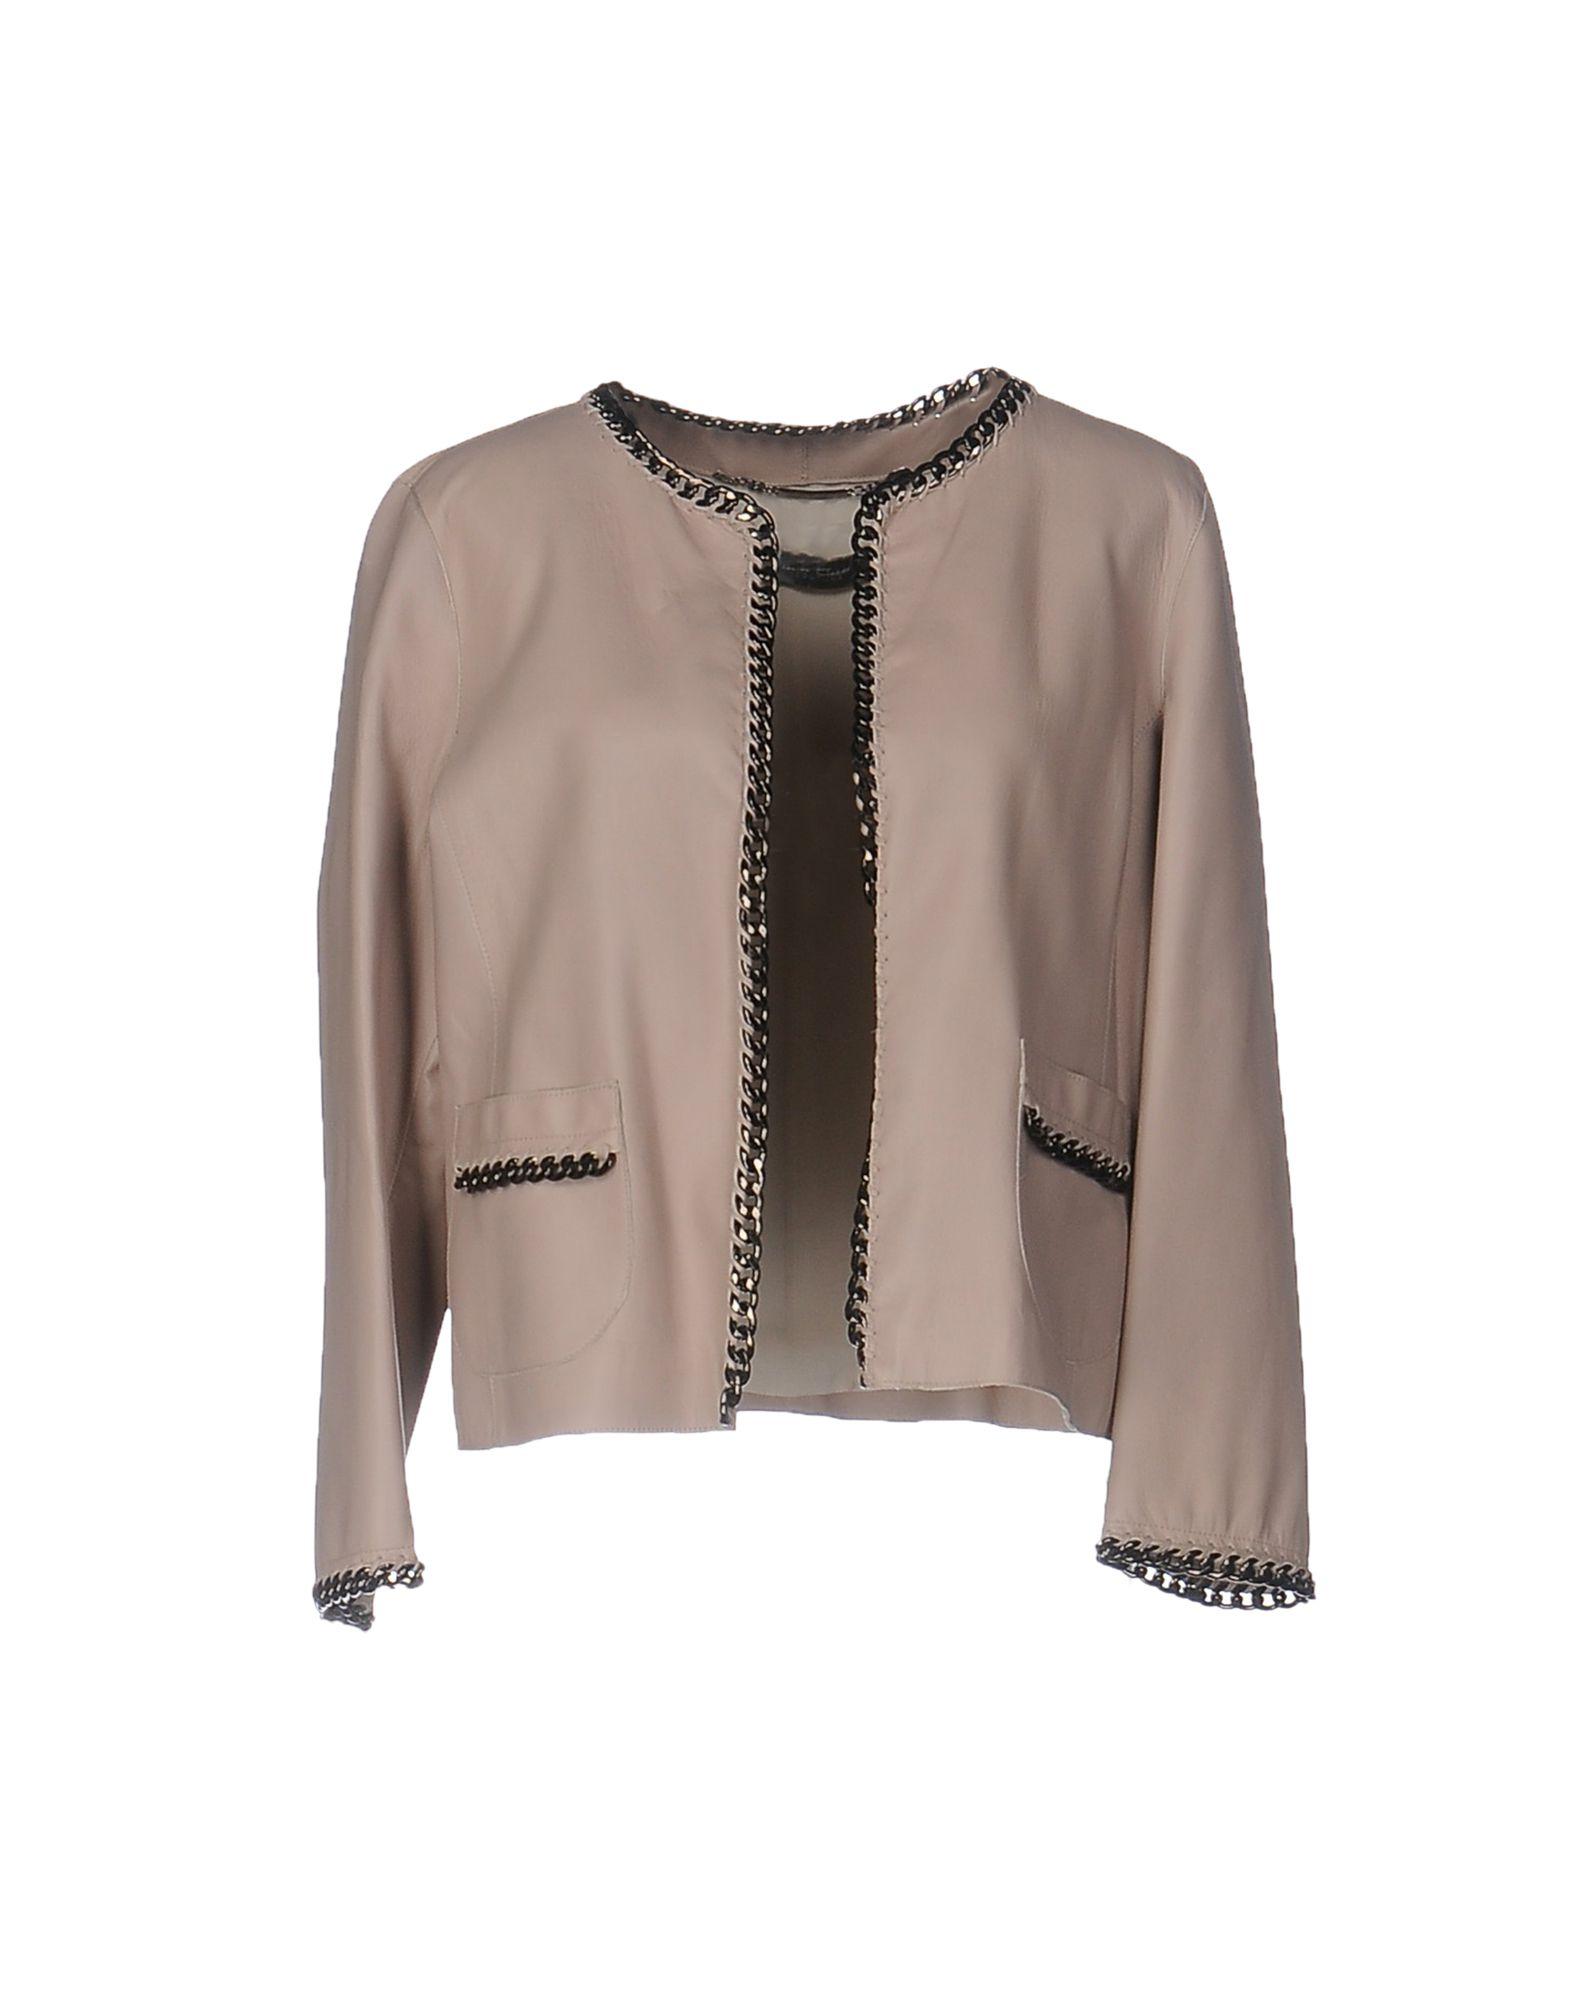 VIA | CORSI Damen Jackett Farbe Taubengrau Größe 6 jetztbilligerkaufen